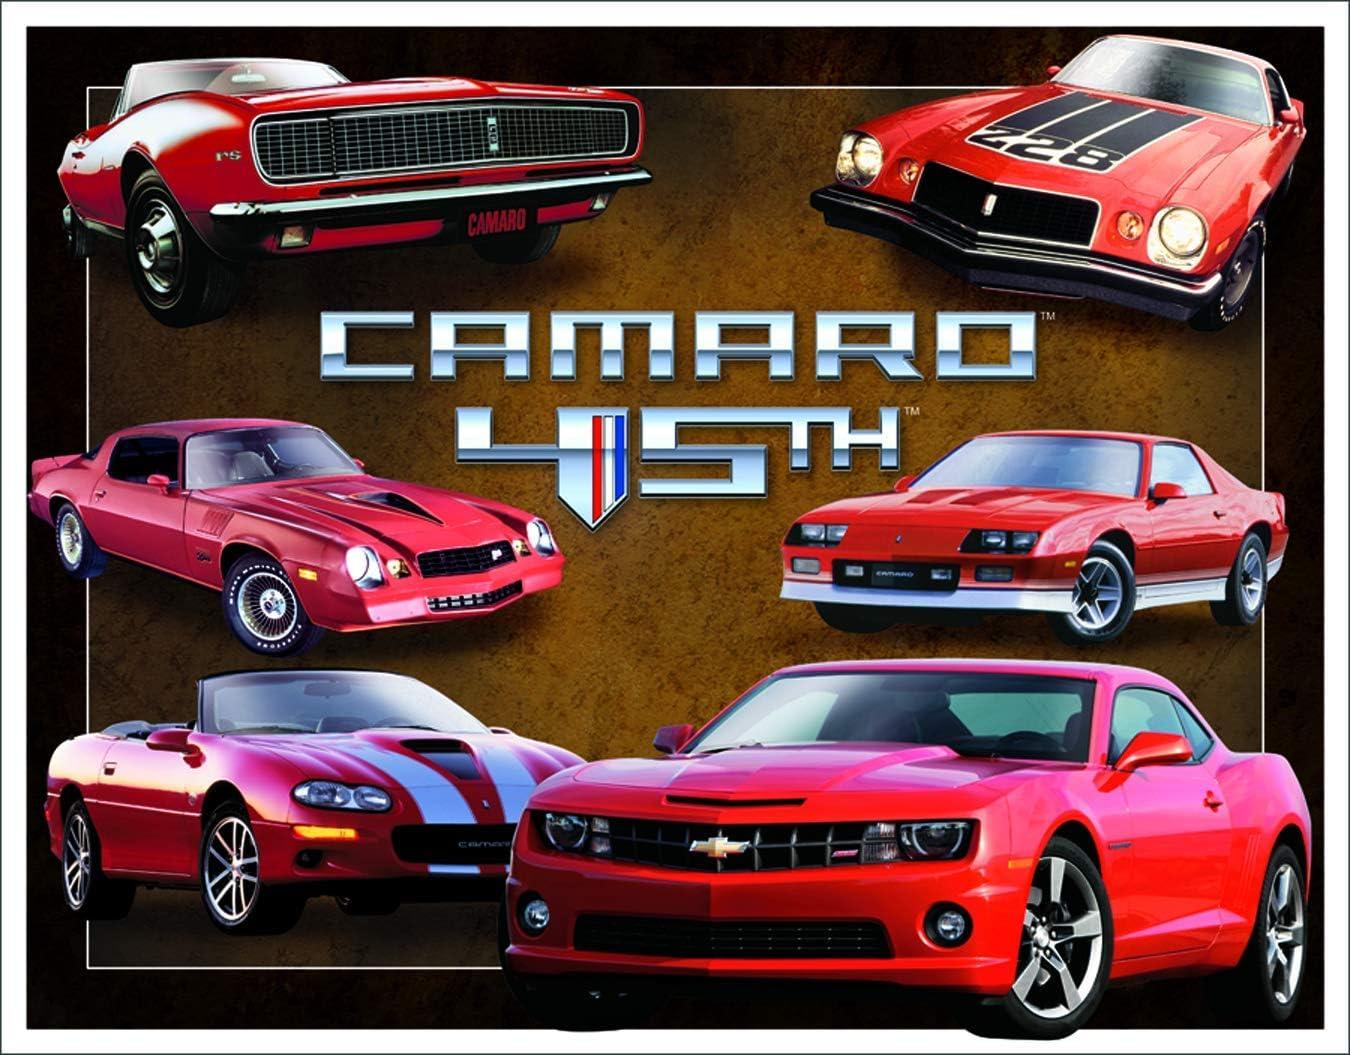 "Chevrolet Camaro Sports car poster wall art home decor photo print 24x24/"" inches"